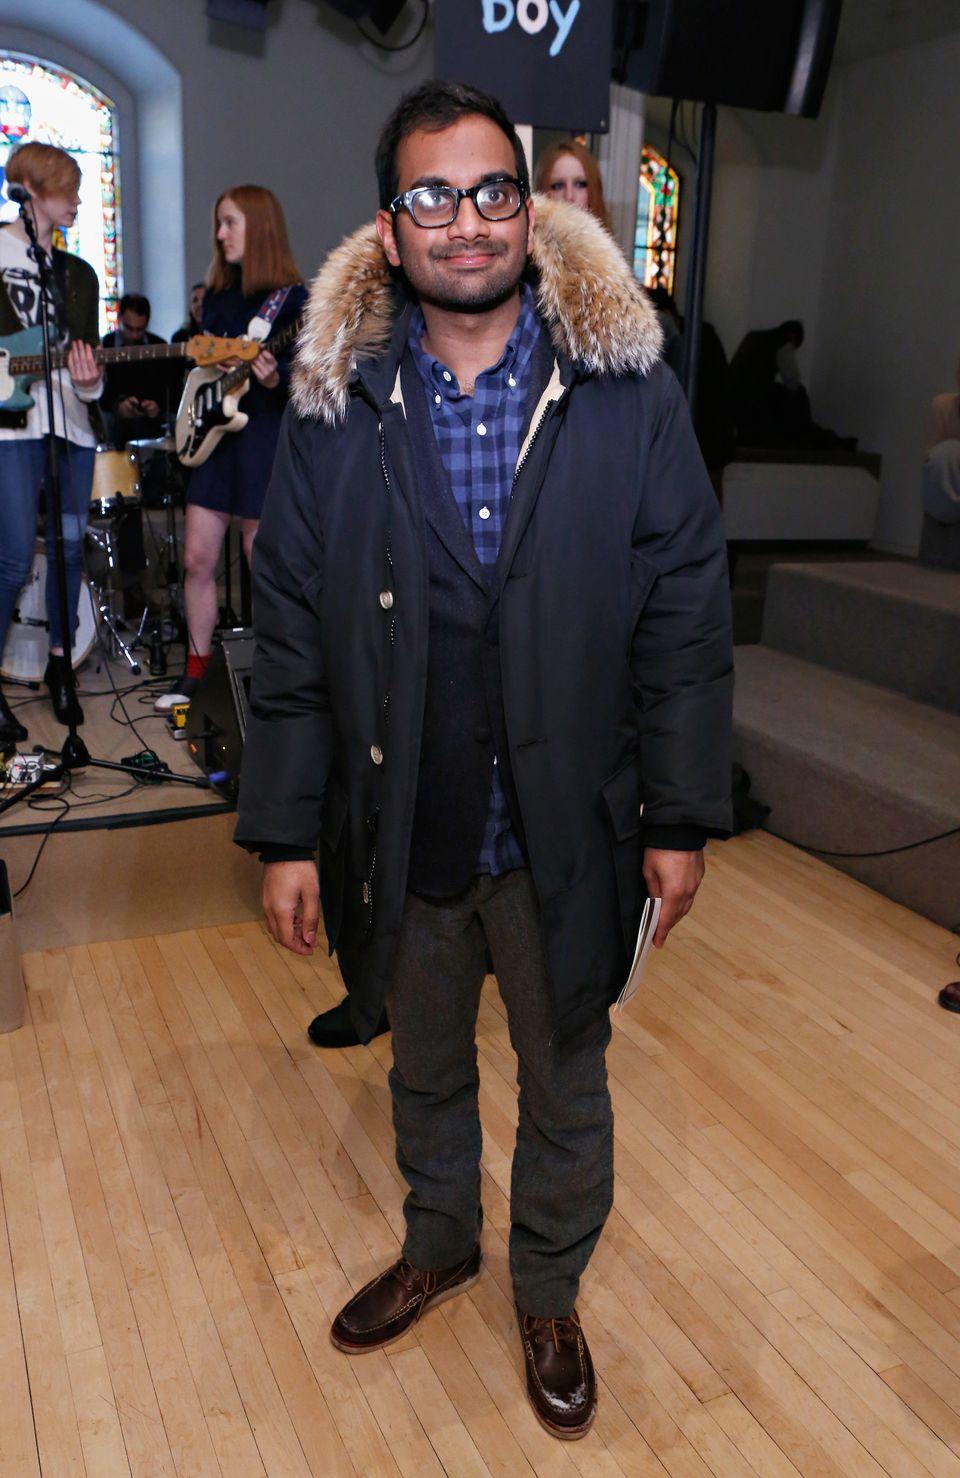 NEW YORK, NY - FEBRUARY 09:  Comedian/ actor Aziz Ansari attends the Chloe Sevigny for Opening Ceremony fall 2013 fashion sho